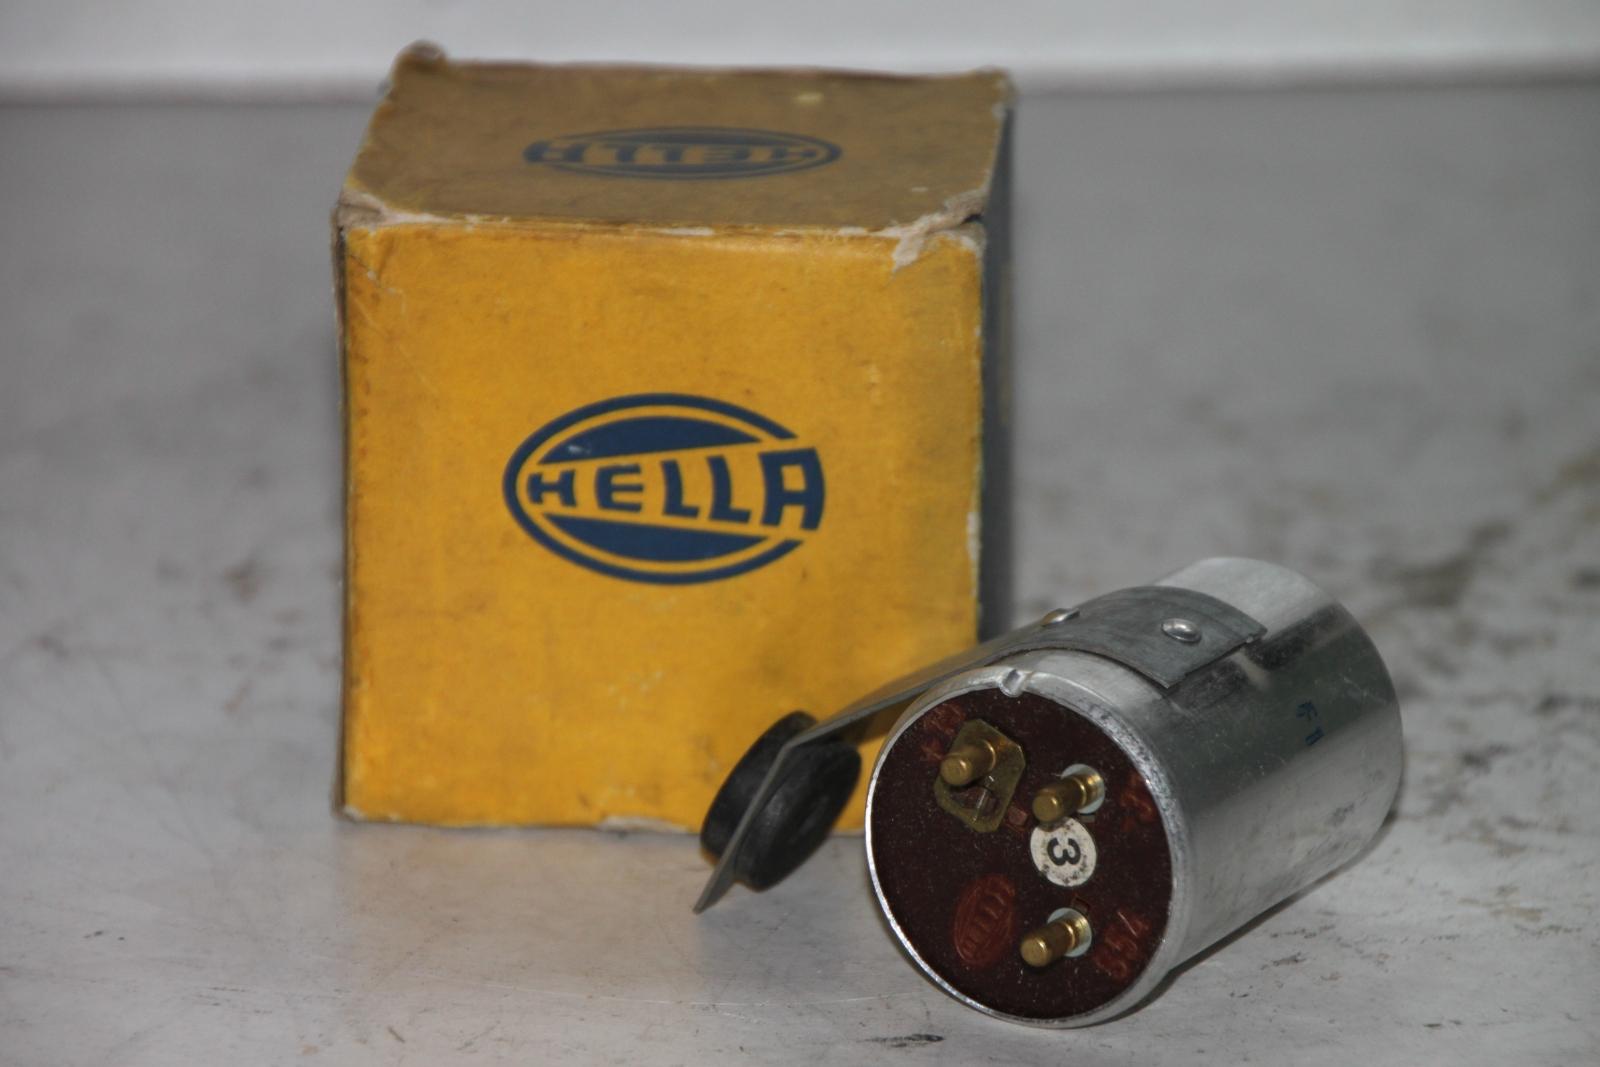 HELLA Blinkgeber  91PS1E 2x18W 4NB001814-00 12V Opel Rekord A B bis 7/66